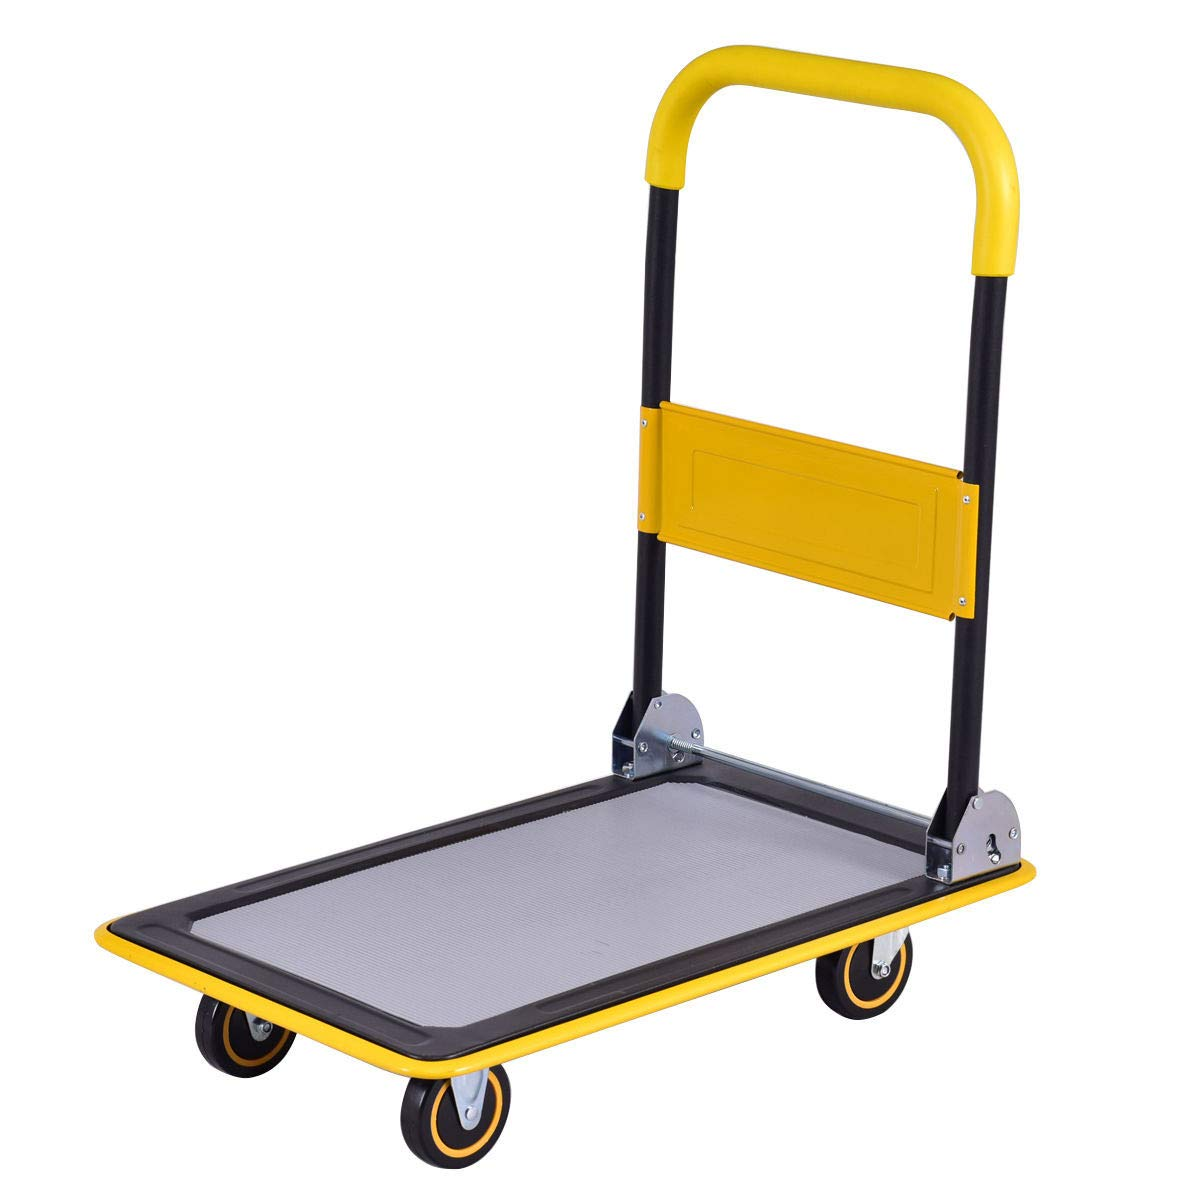 330 lbs Folding Platform Cart Dolly Hand Truck by AchieveUSA